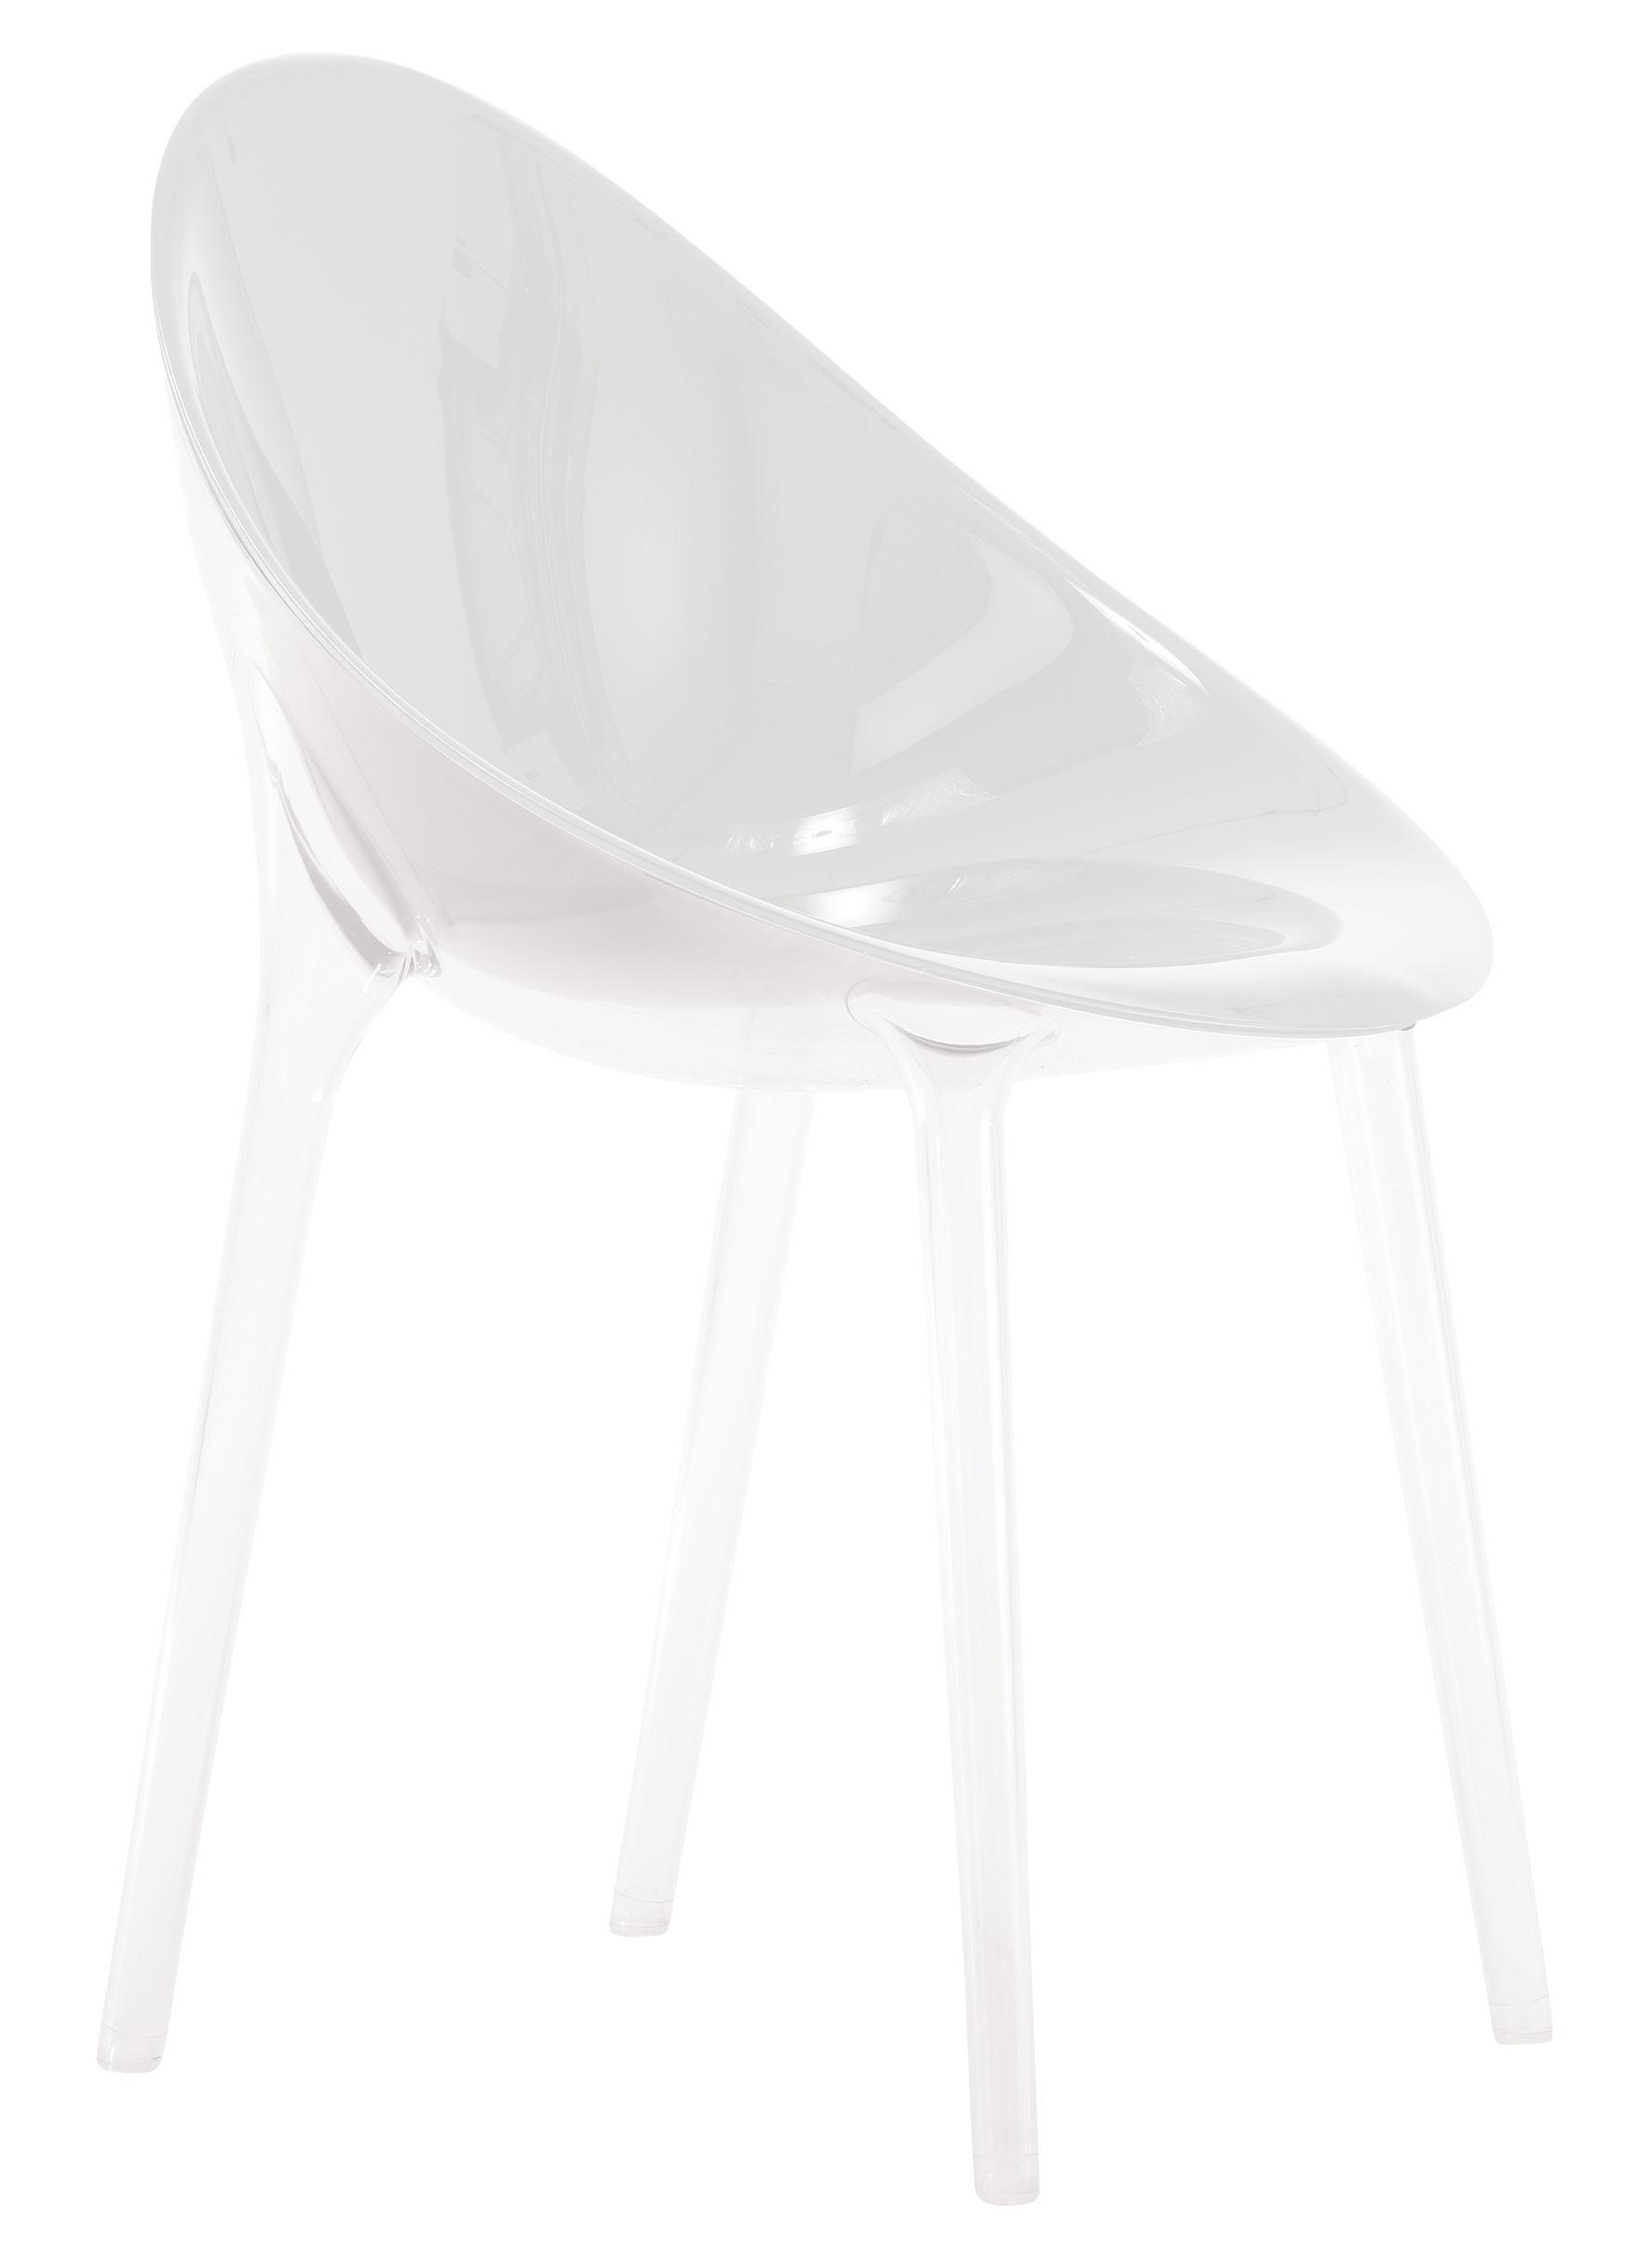 Möbel - Stühle  - Mr. Impossible Sessel Opak - Kartell - Opakweiß - Polykarbonat